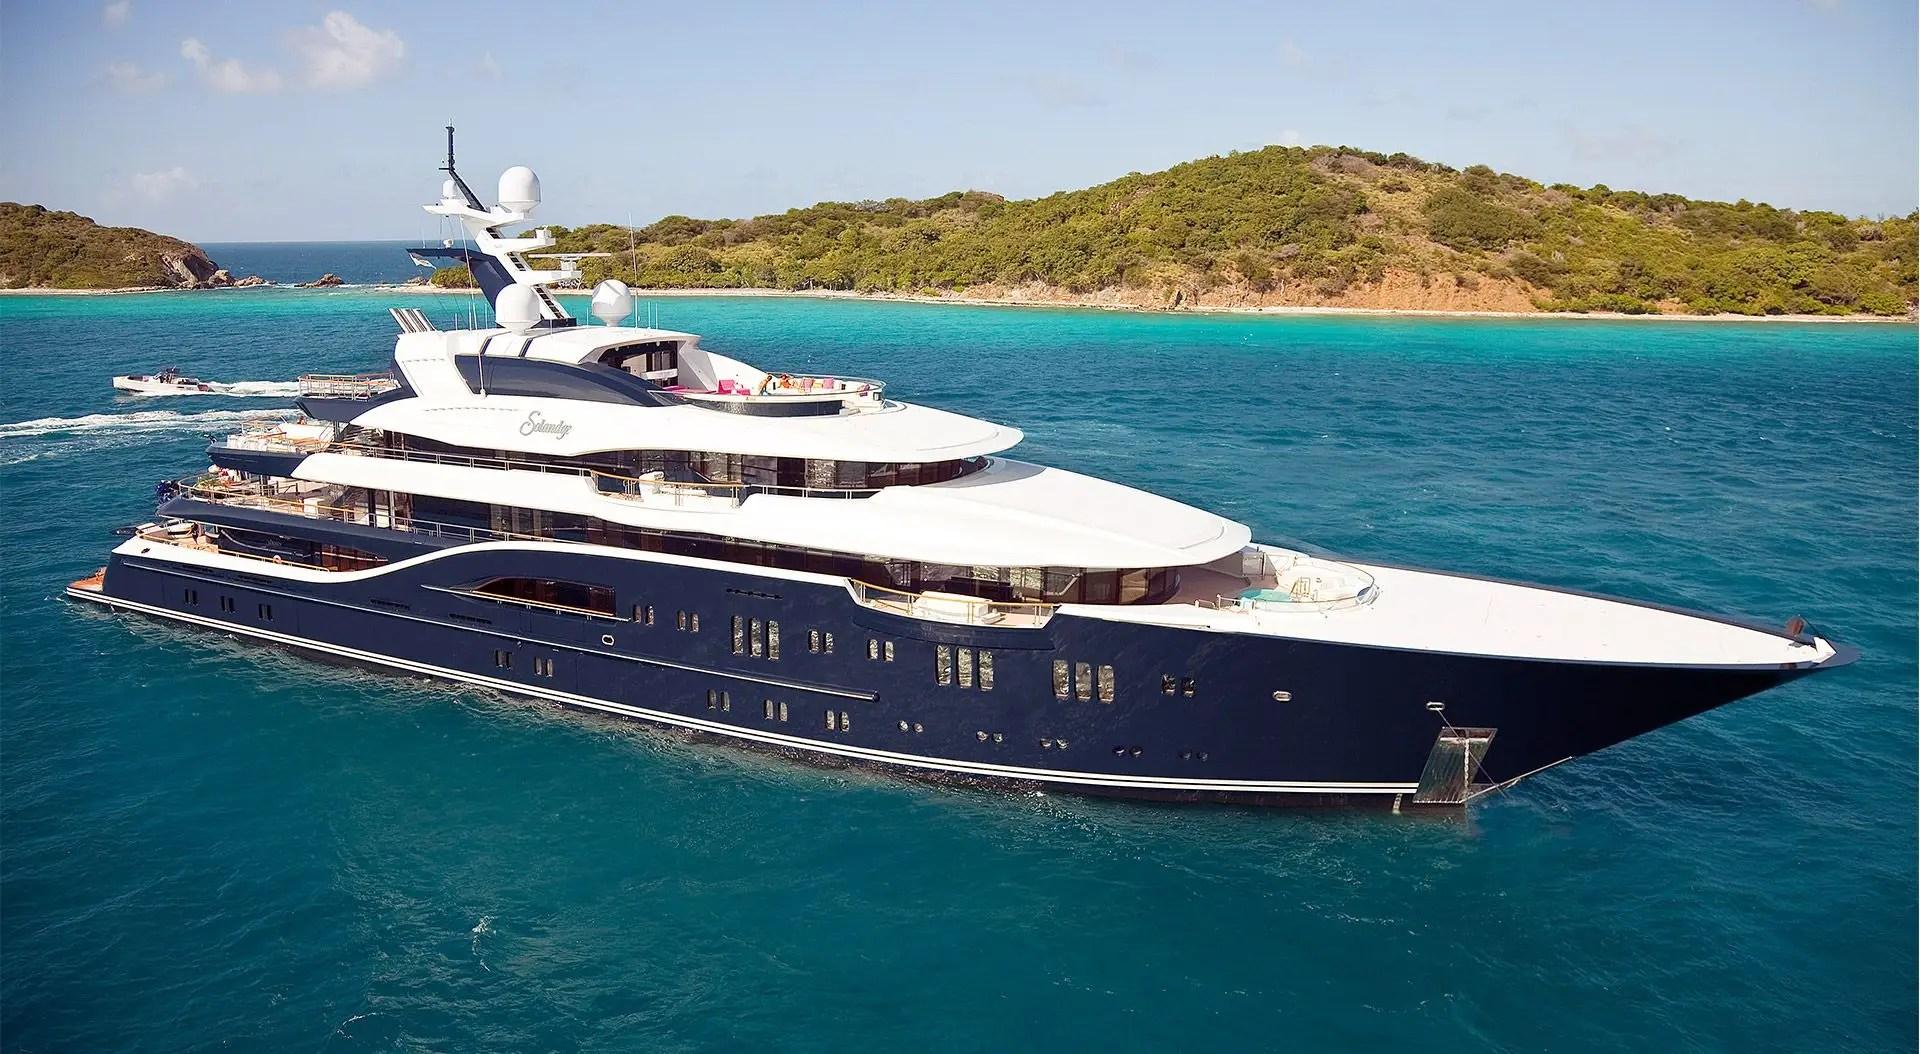 Lurssen Superyacht Solandge Sold Biggest Deal Of 2017